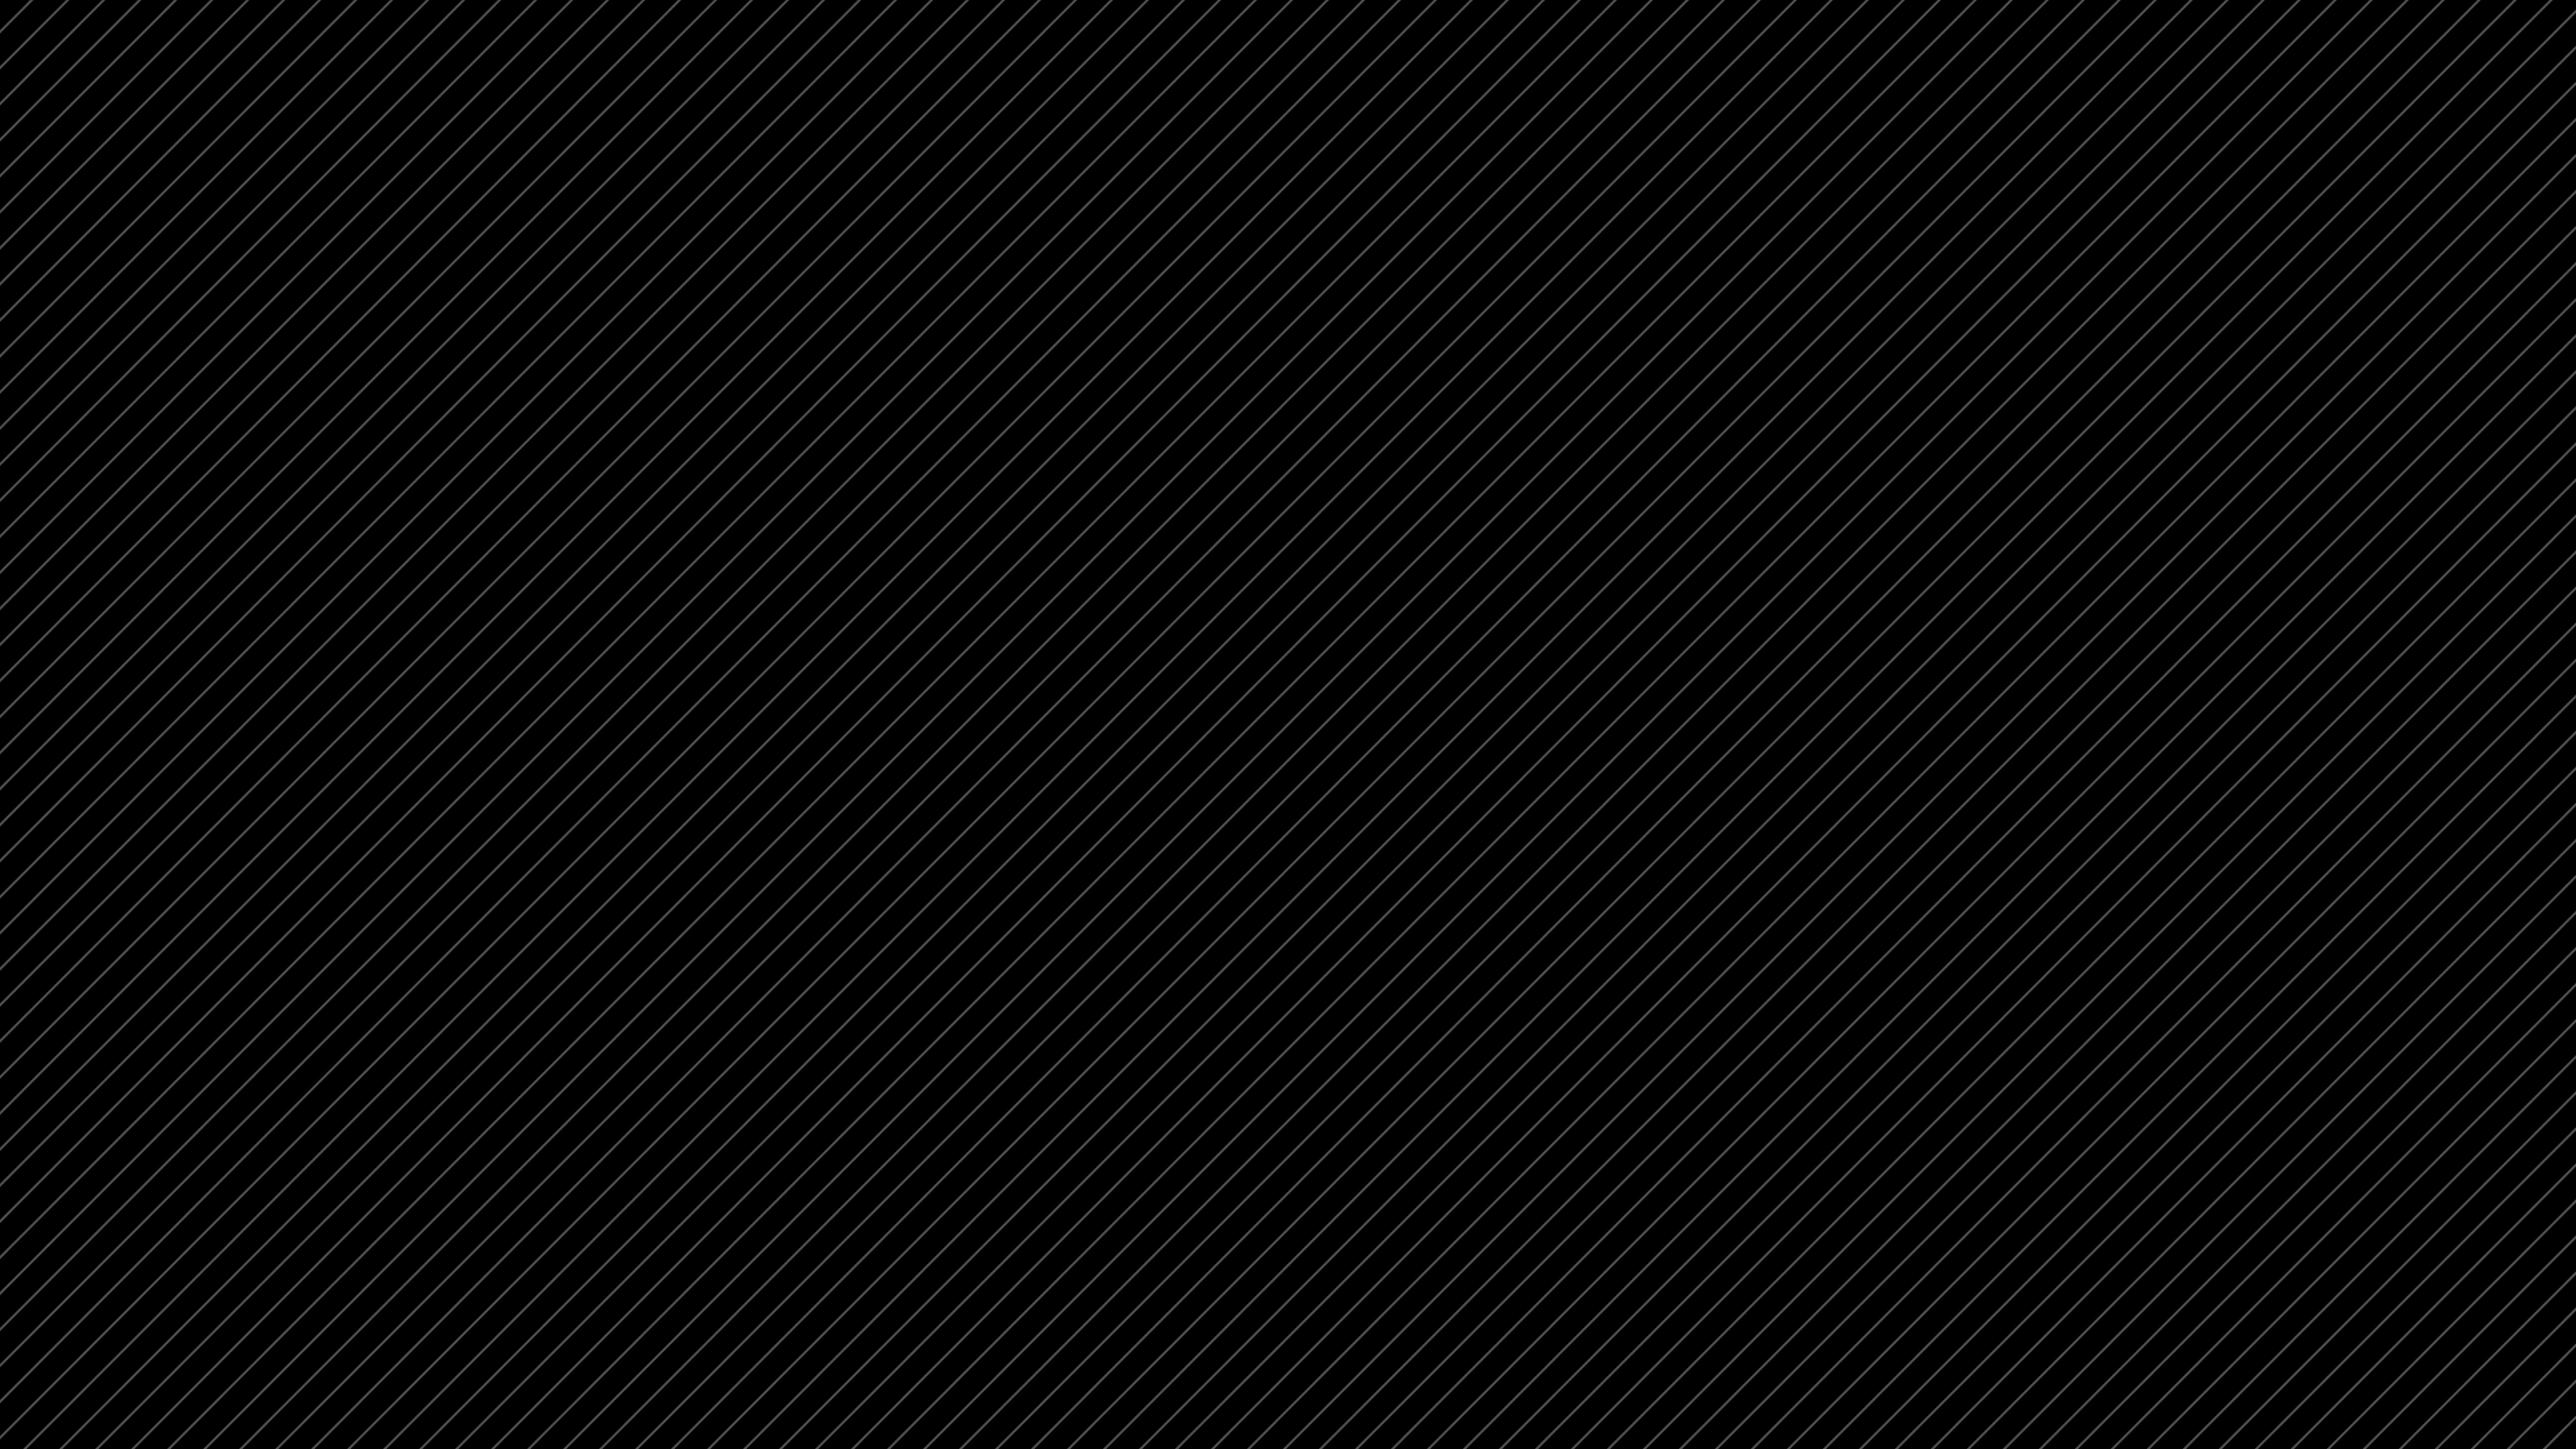 Fondos de pantalla Patrón de líneas Negro